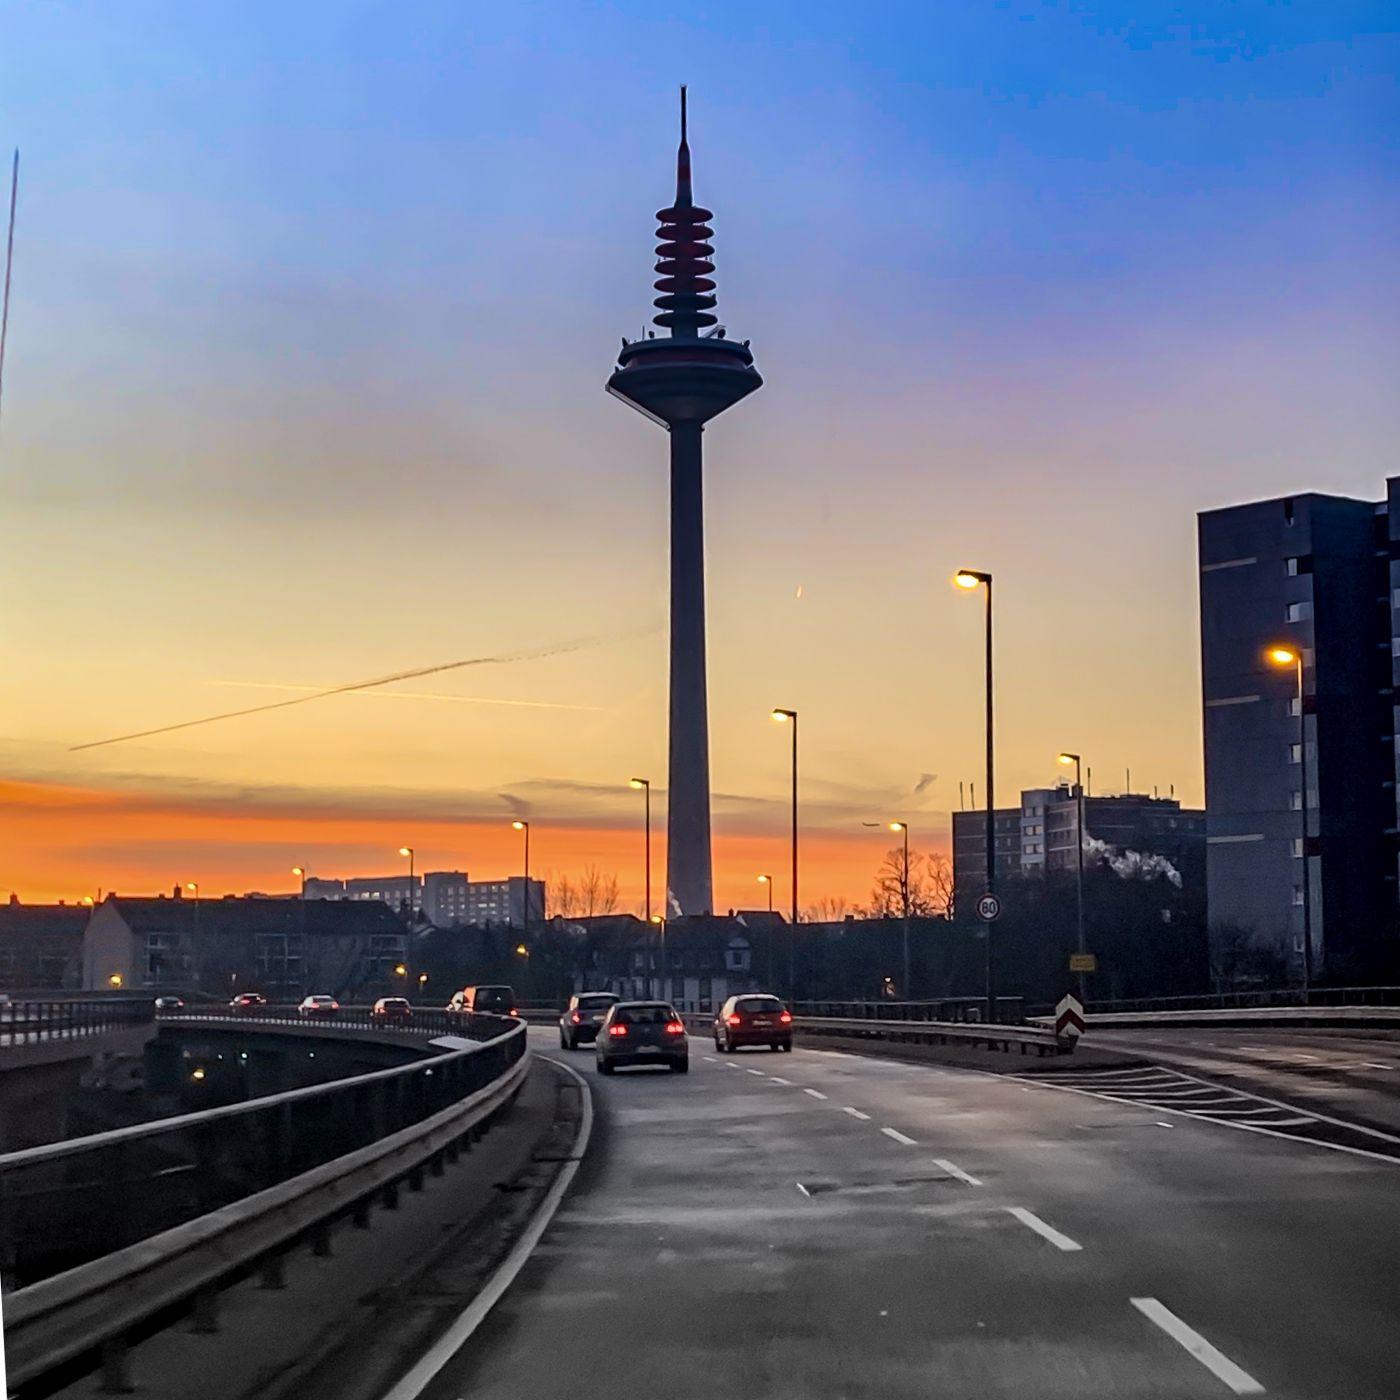 Europaturm Frankfurt, Germany